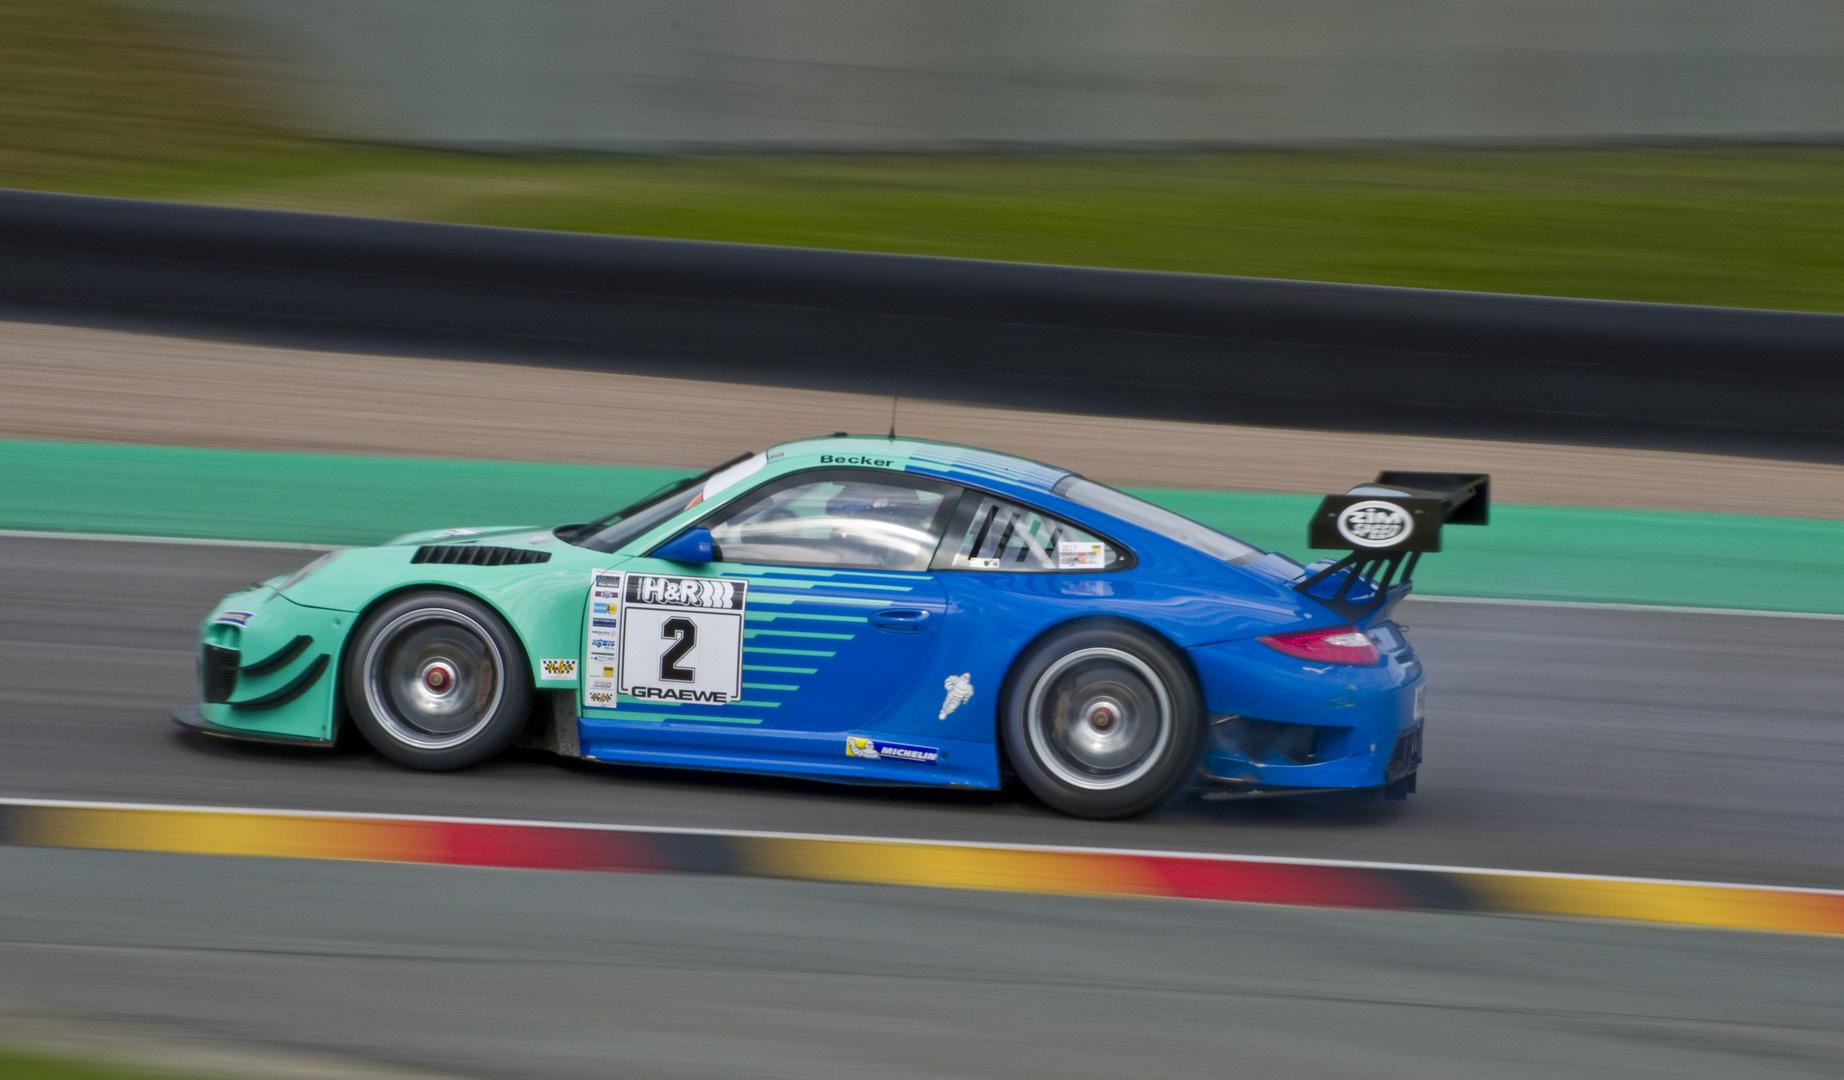 Spezial Tourenwagen - Porsche 911